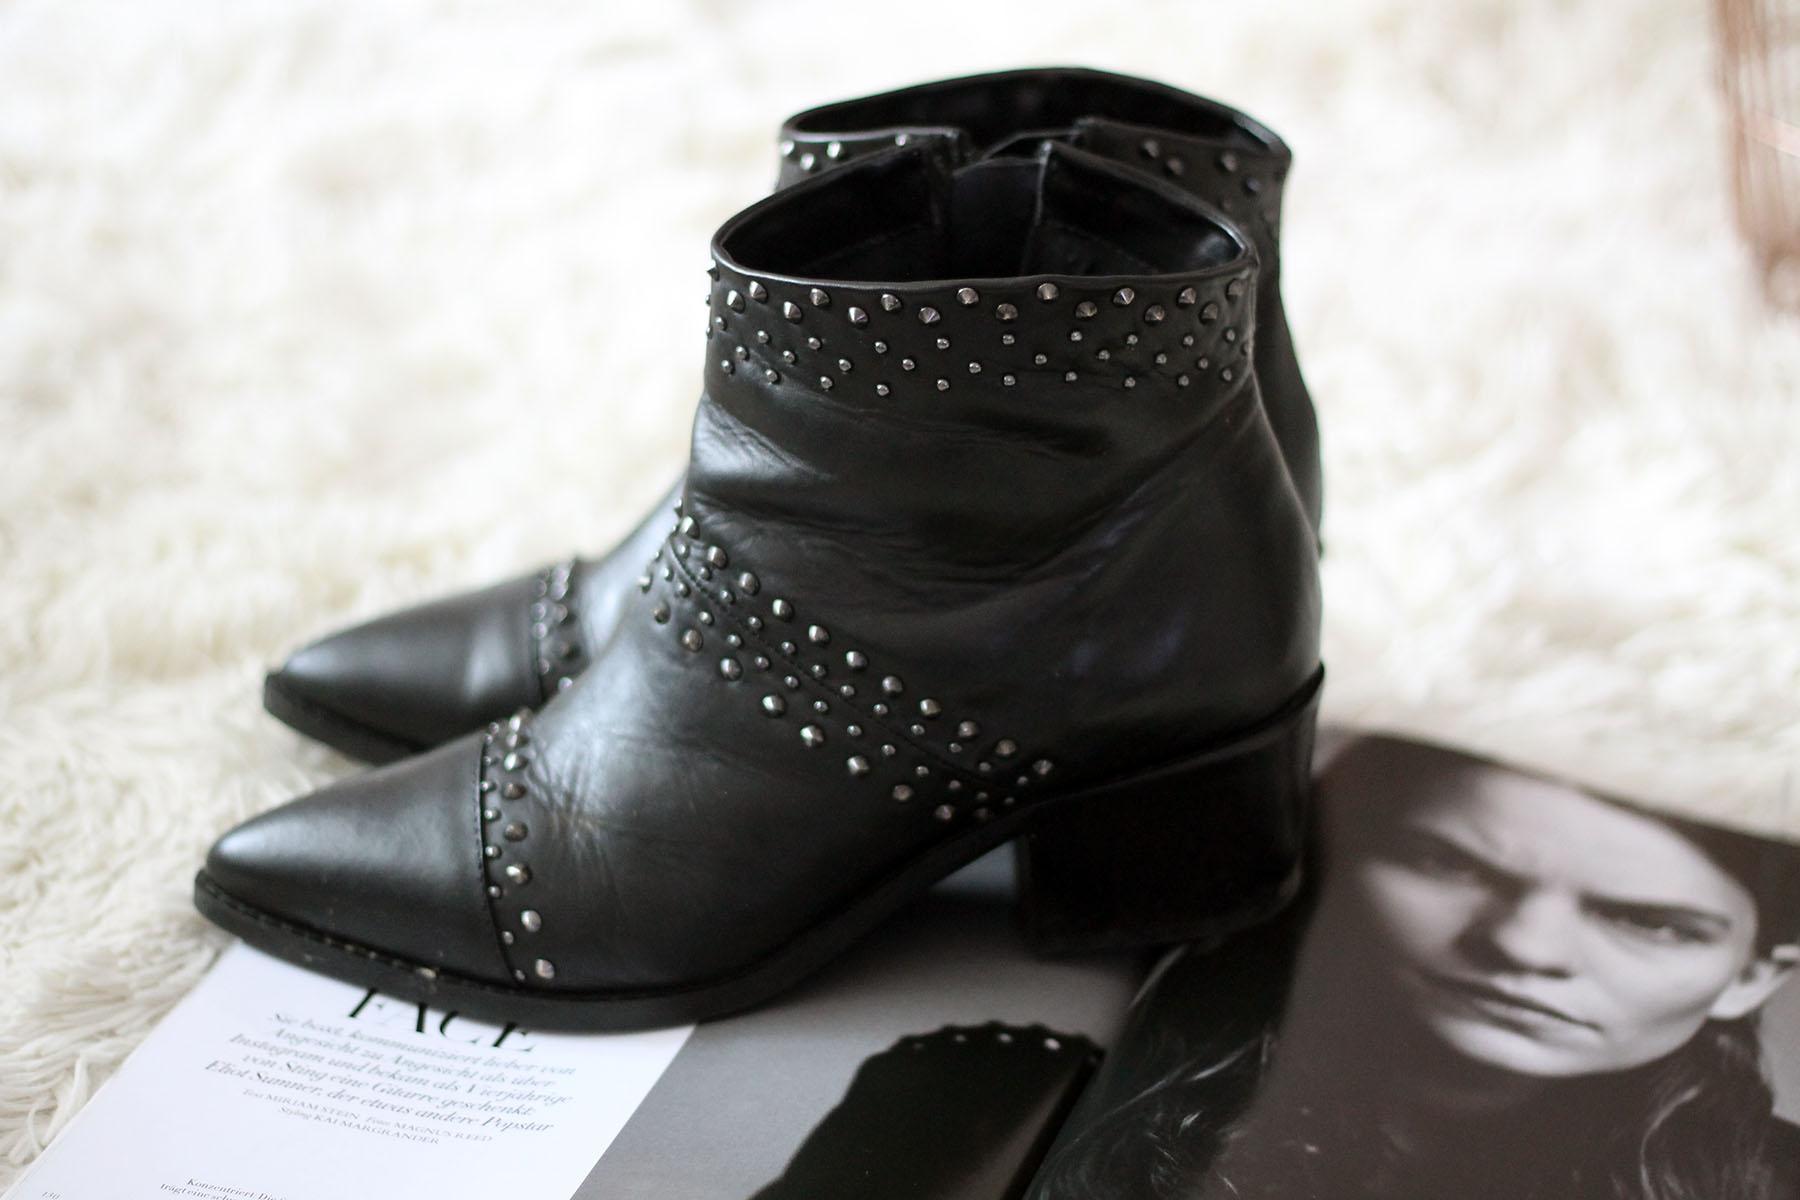 modeblog-fashionblog-new-in-haul-stiefeletten-nieten-outfit